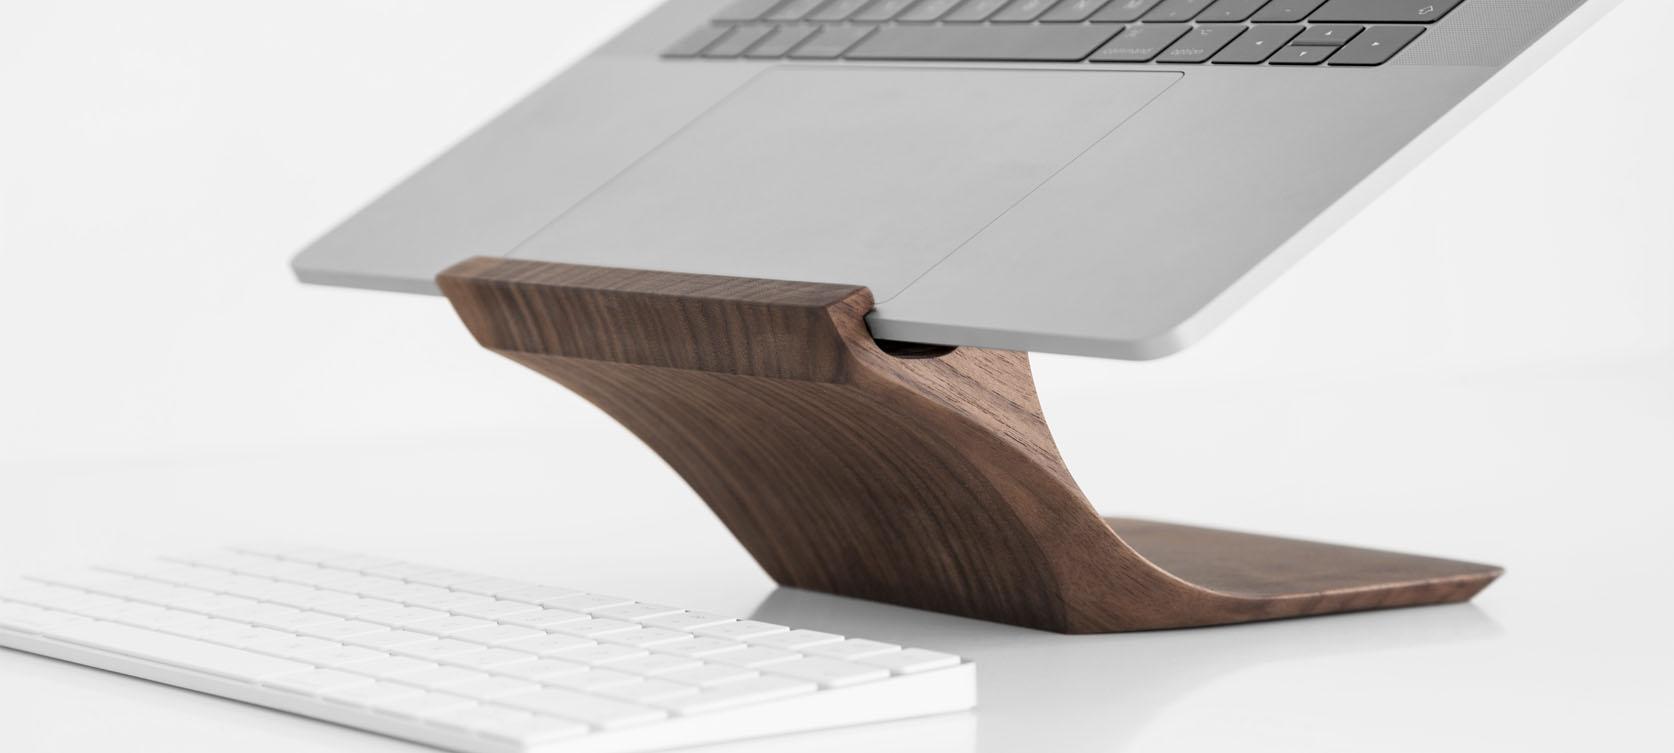 YOHANN-Edle-Halterung-f-r-das-MacBook-